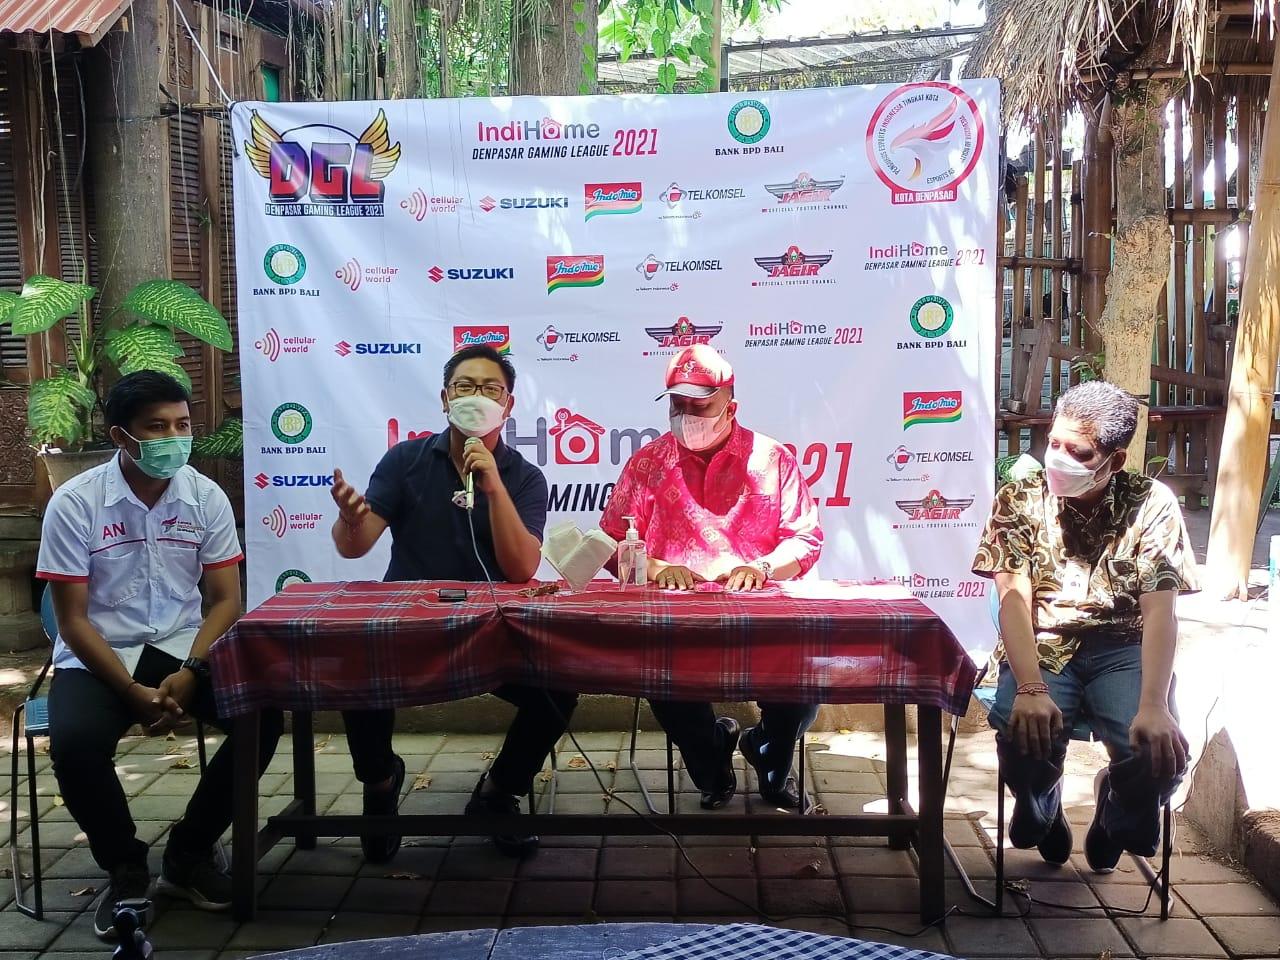 Wakil Walikota Denpasar, Kadek Agus Arya Wibawa saat pers conference kompetisi bertajuk 'Denpasar Gaming League 2021' , Jumat (23/4).